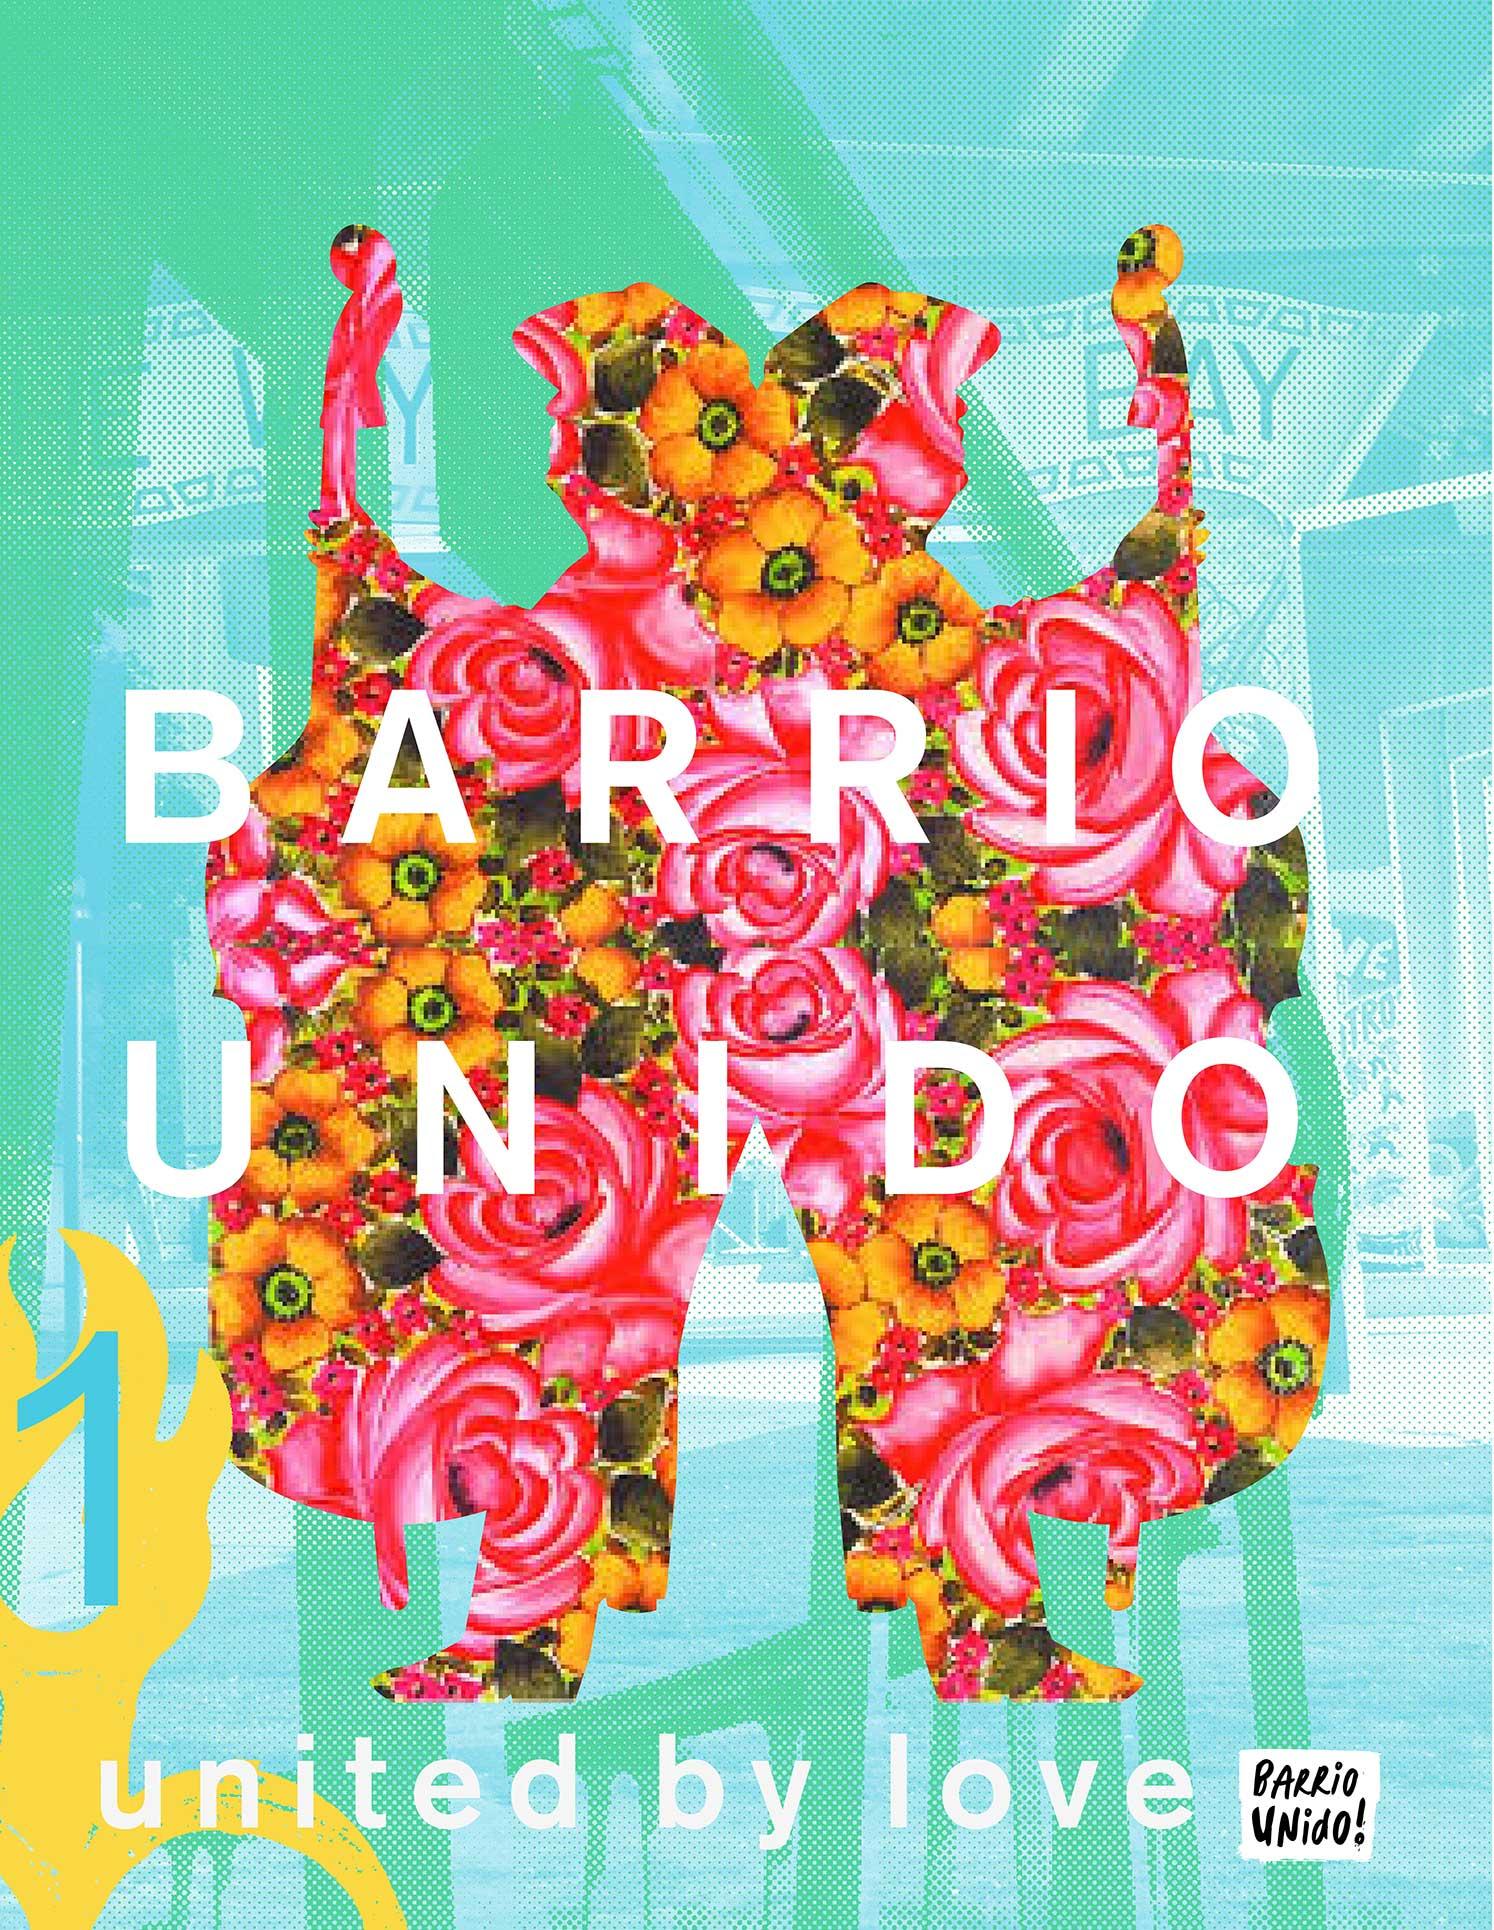 ron-miriello-grafico-barrio-logan-posters-san-diego-community-design-Miriello-branding-officina-02.jpg